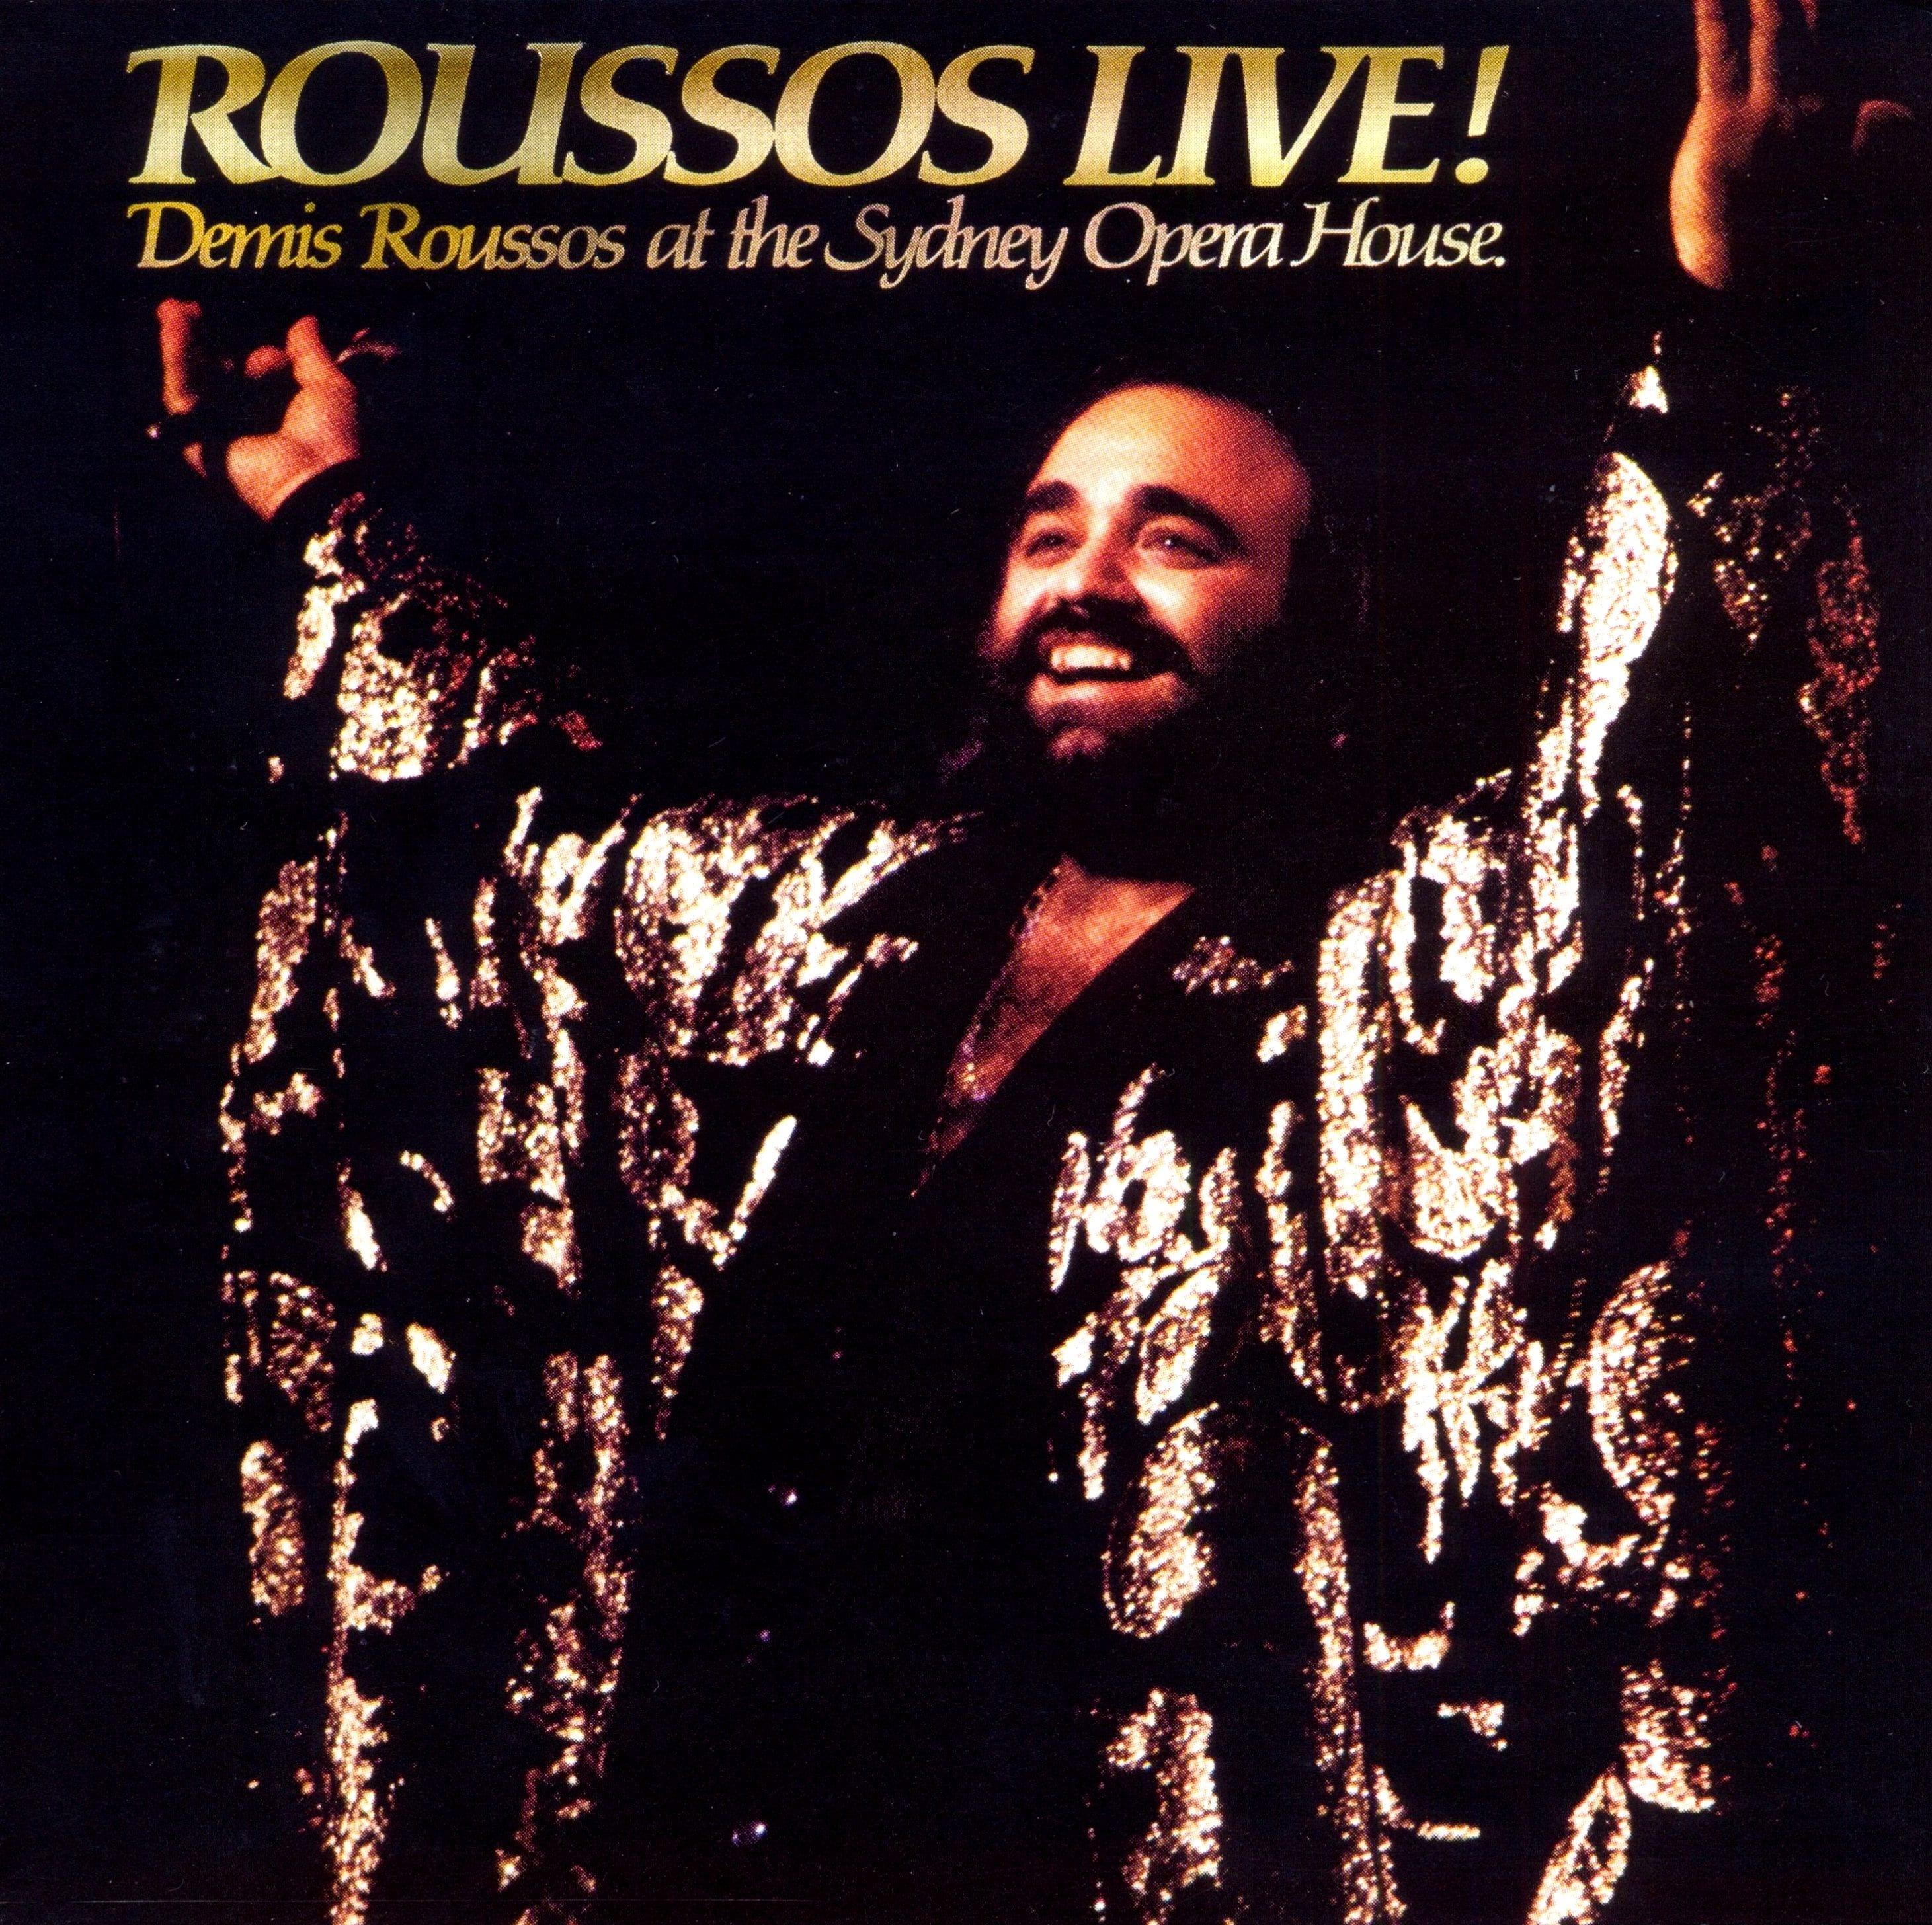 Demis Roussos - Roussos Live! Demis Roussos At The Sydney Opera House (BONUS TRACK) (1980) CD 8